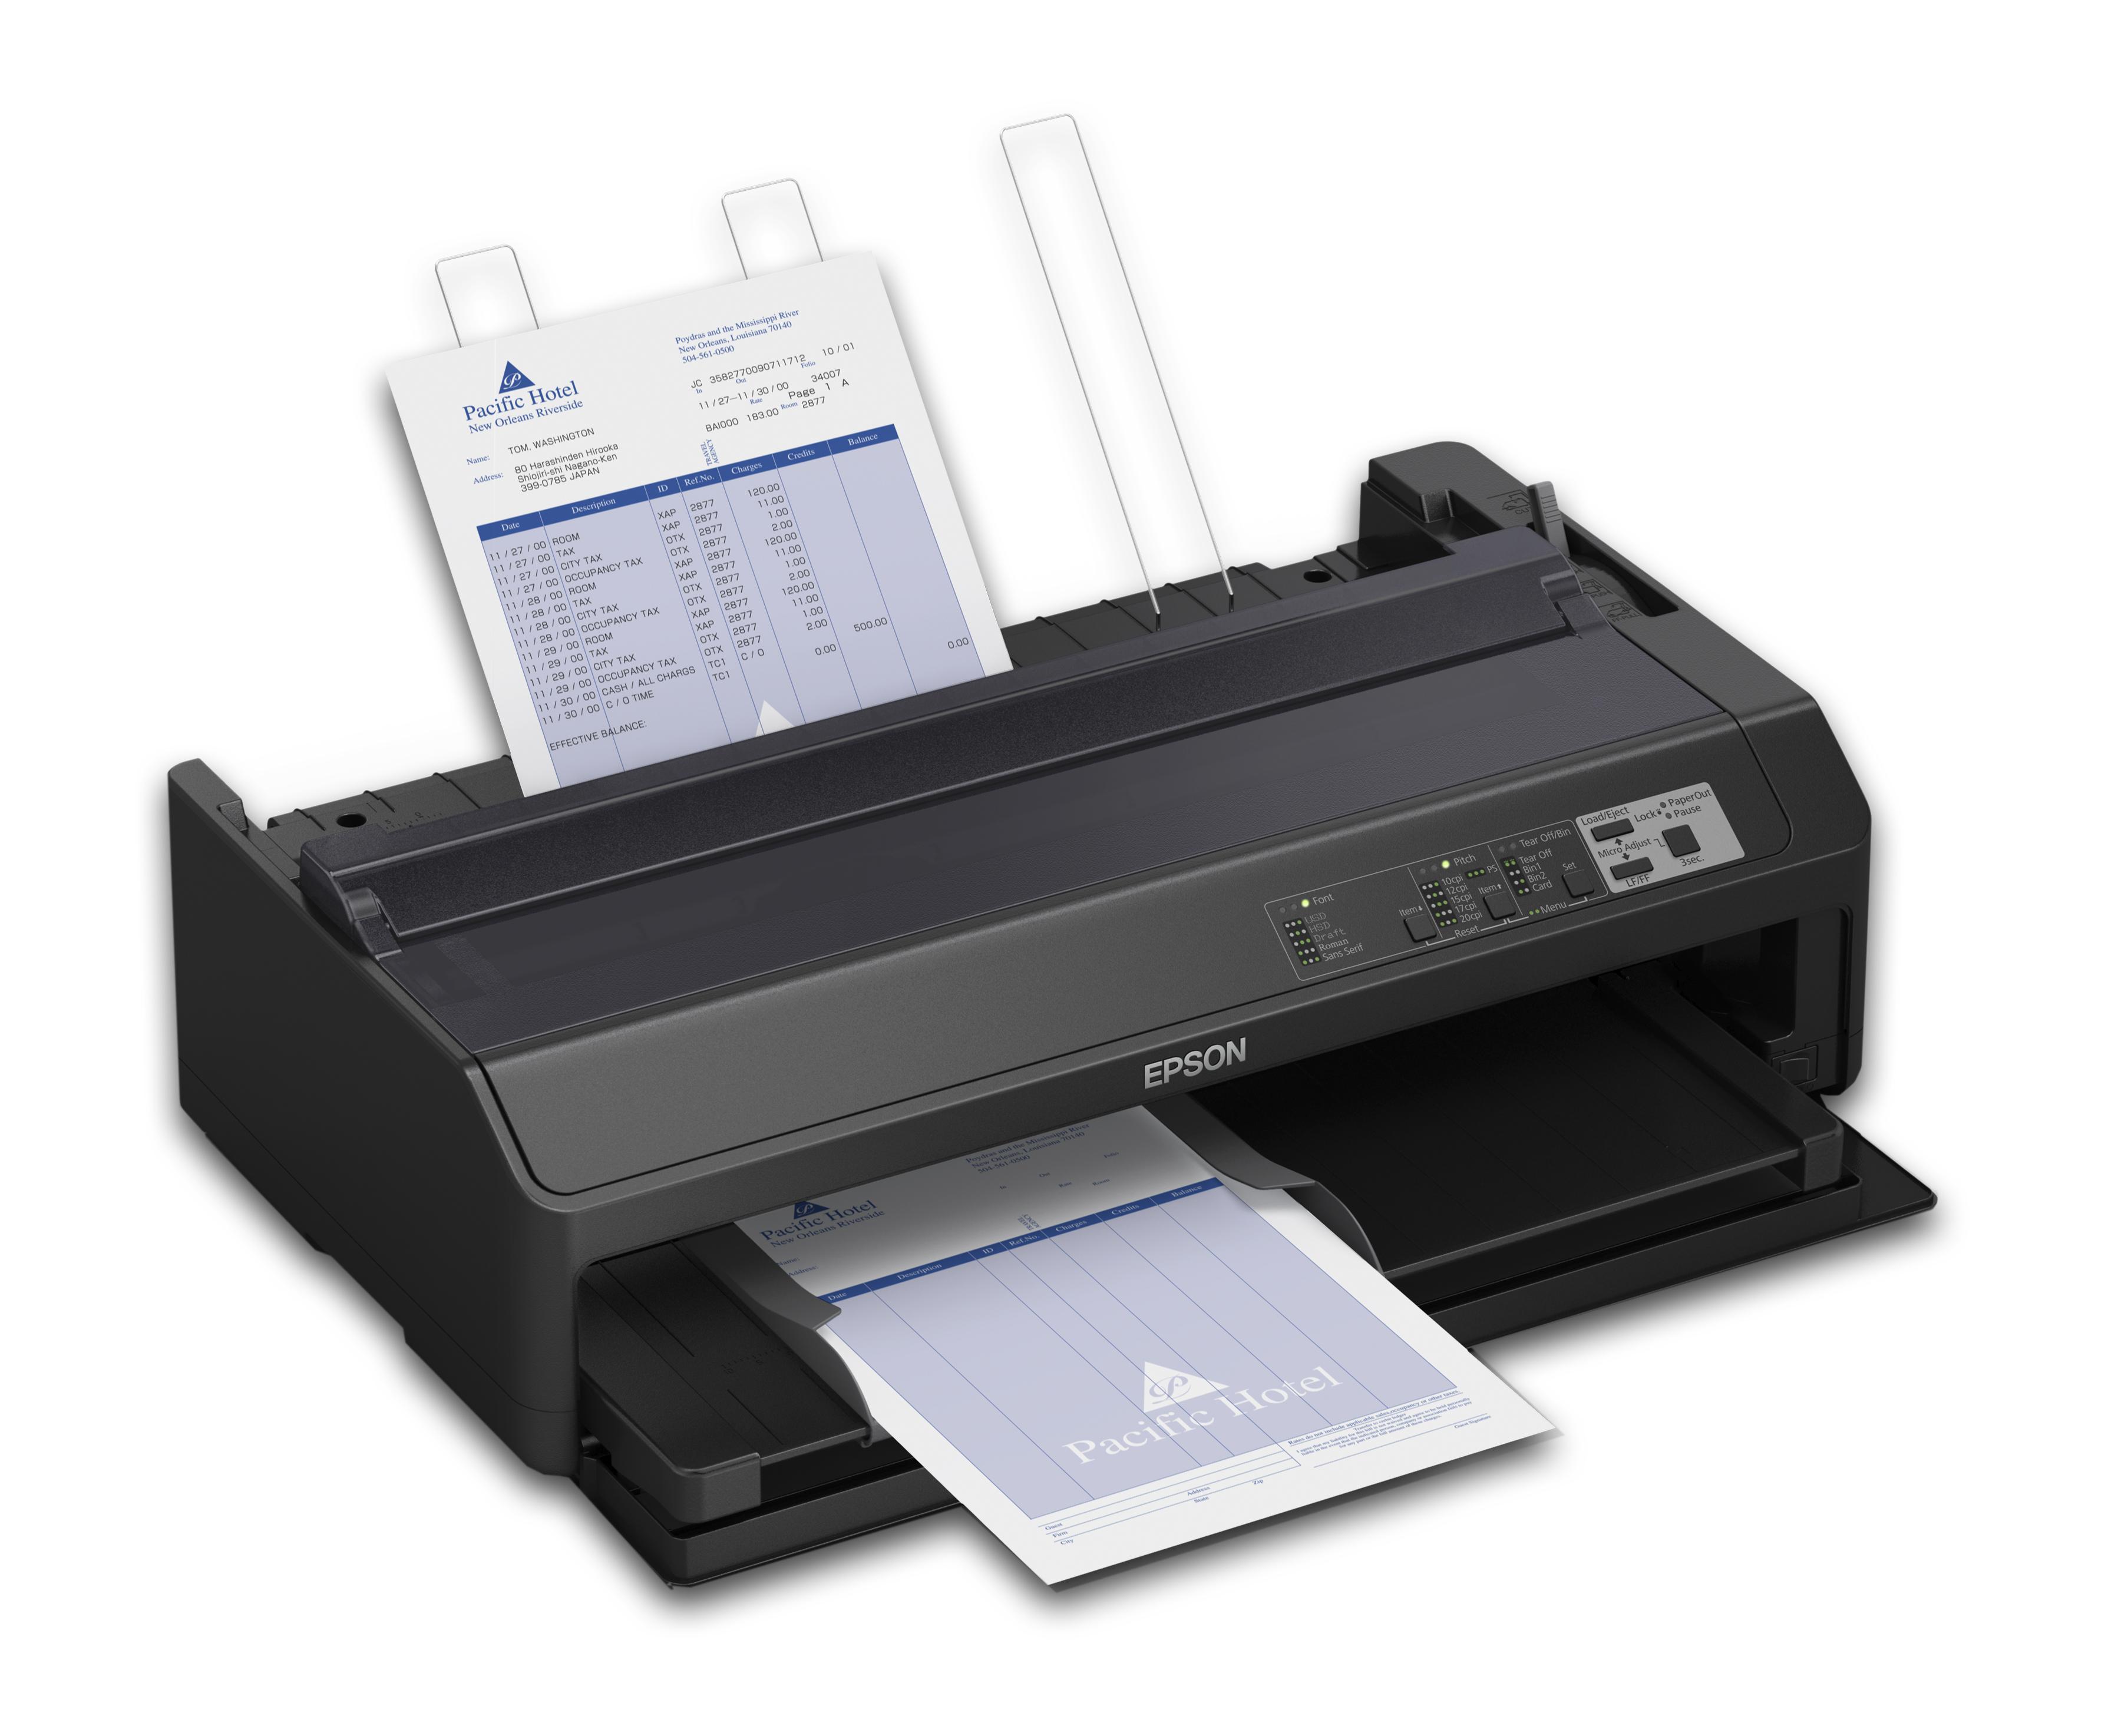 Epson lanza veloces impresoras de matriz de punto para - Impresoras para oficina ...